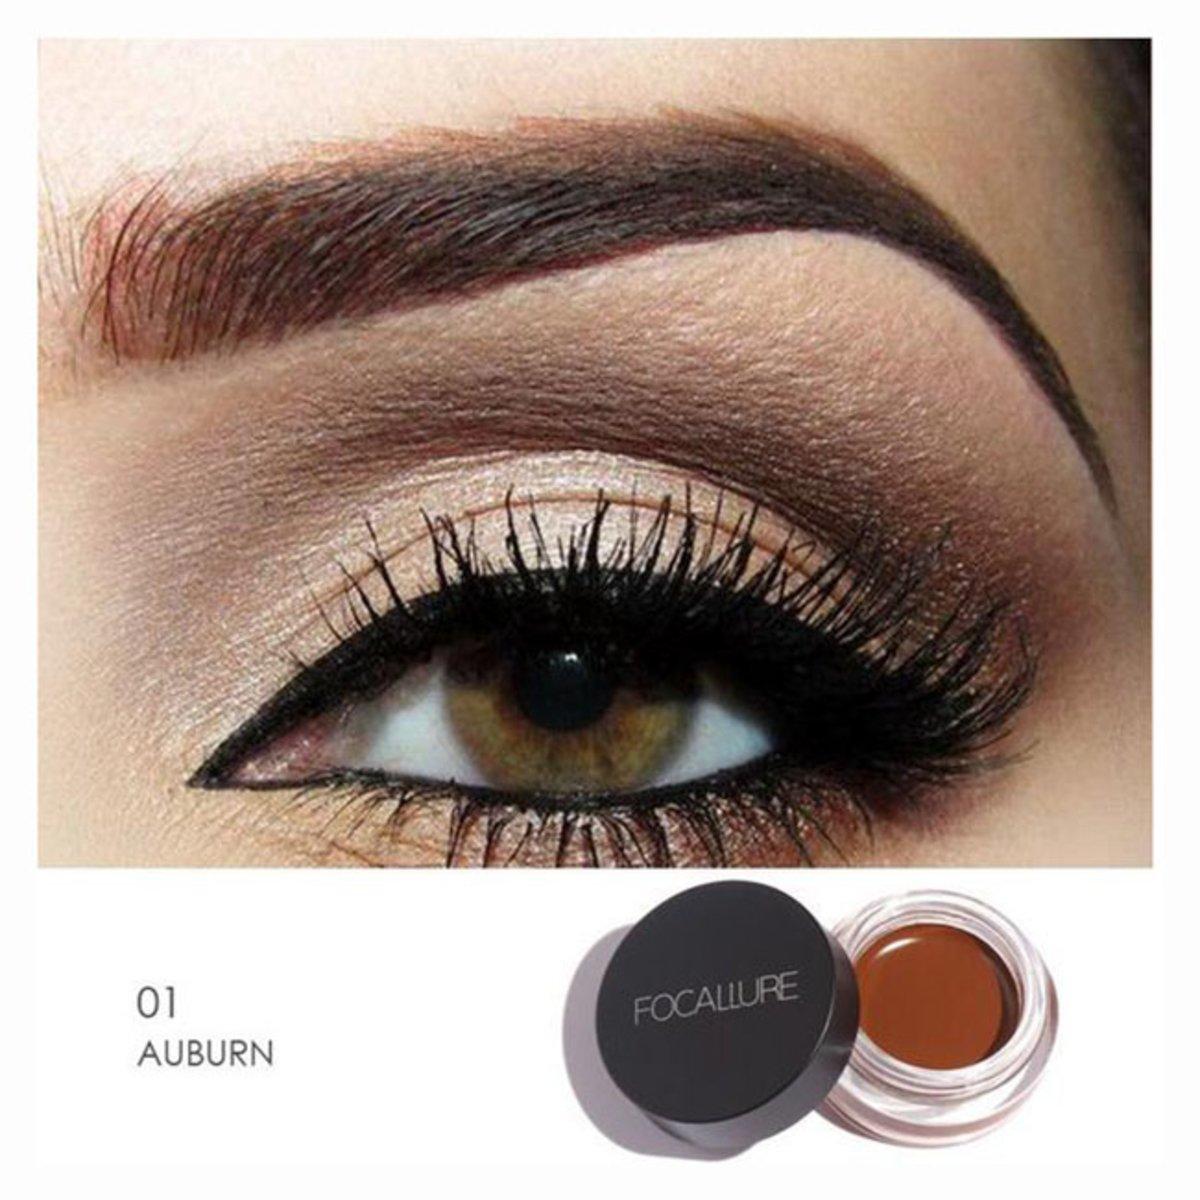 Buy Cgt Focallure Pomade Eyebrow Color Cream Waterproof Long Lasting